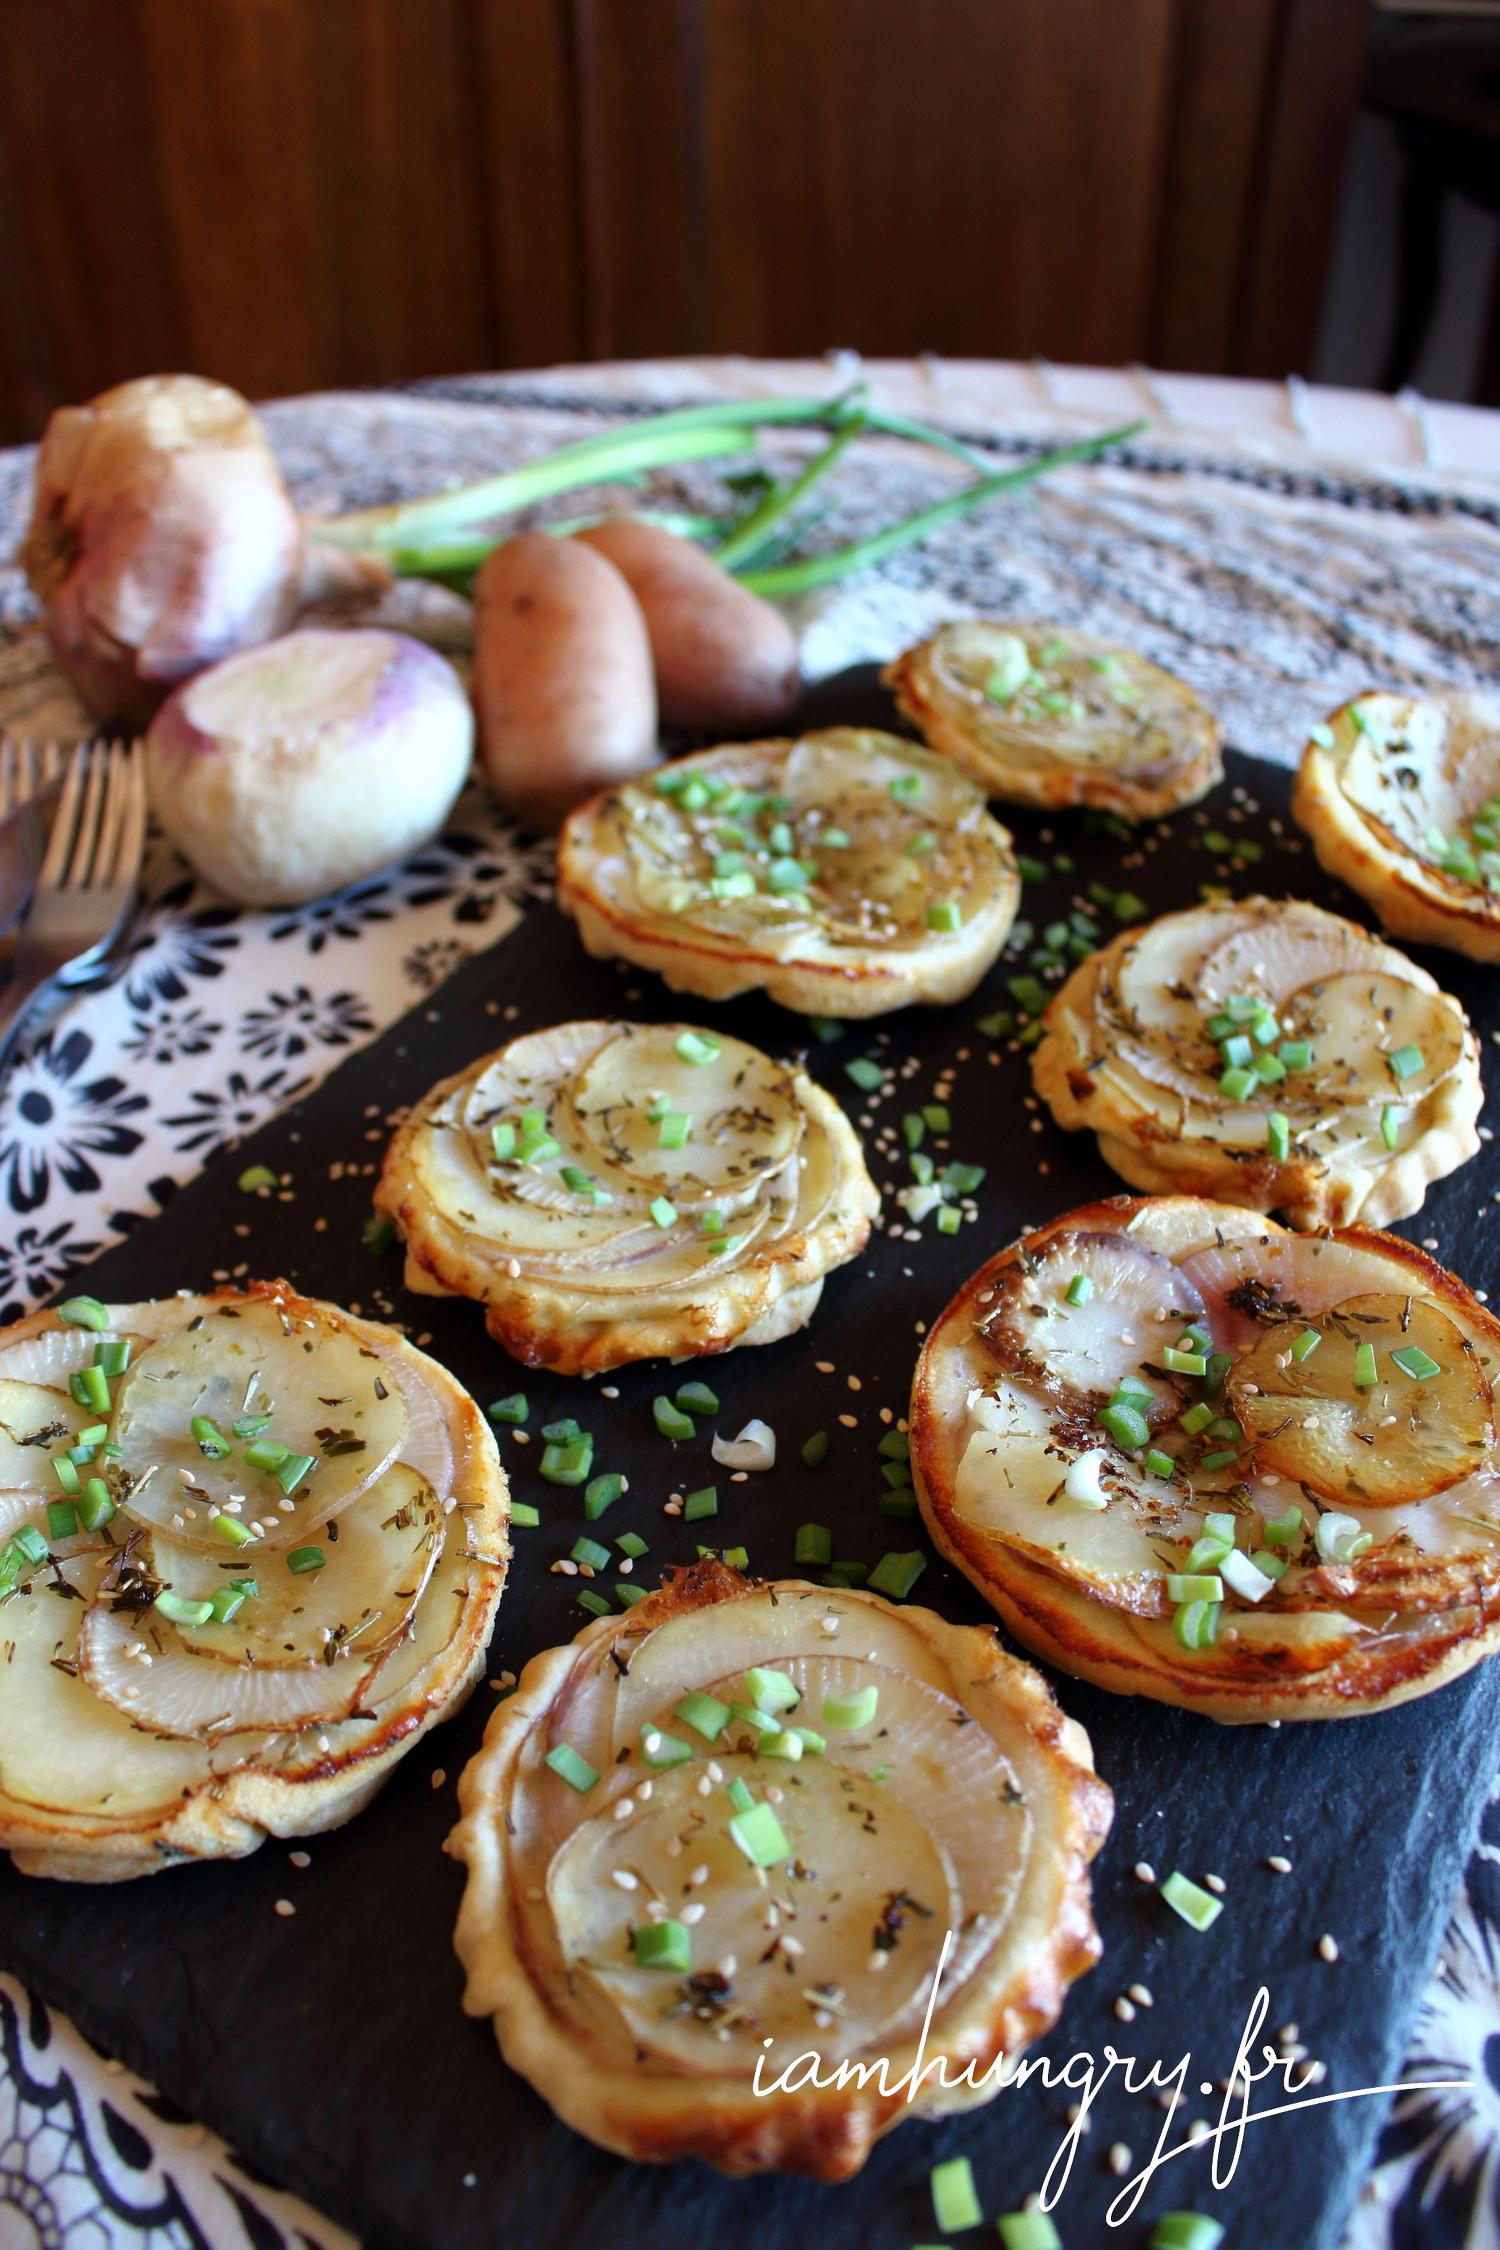 Petites tatins de navets et patates